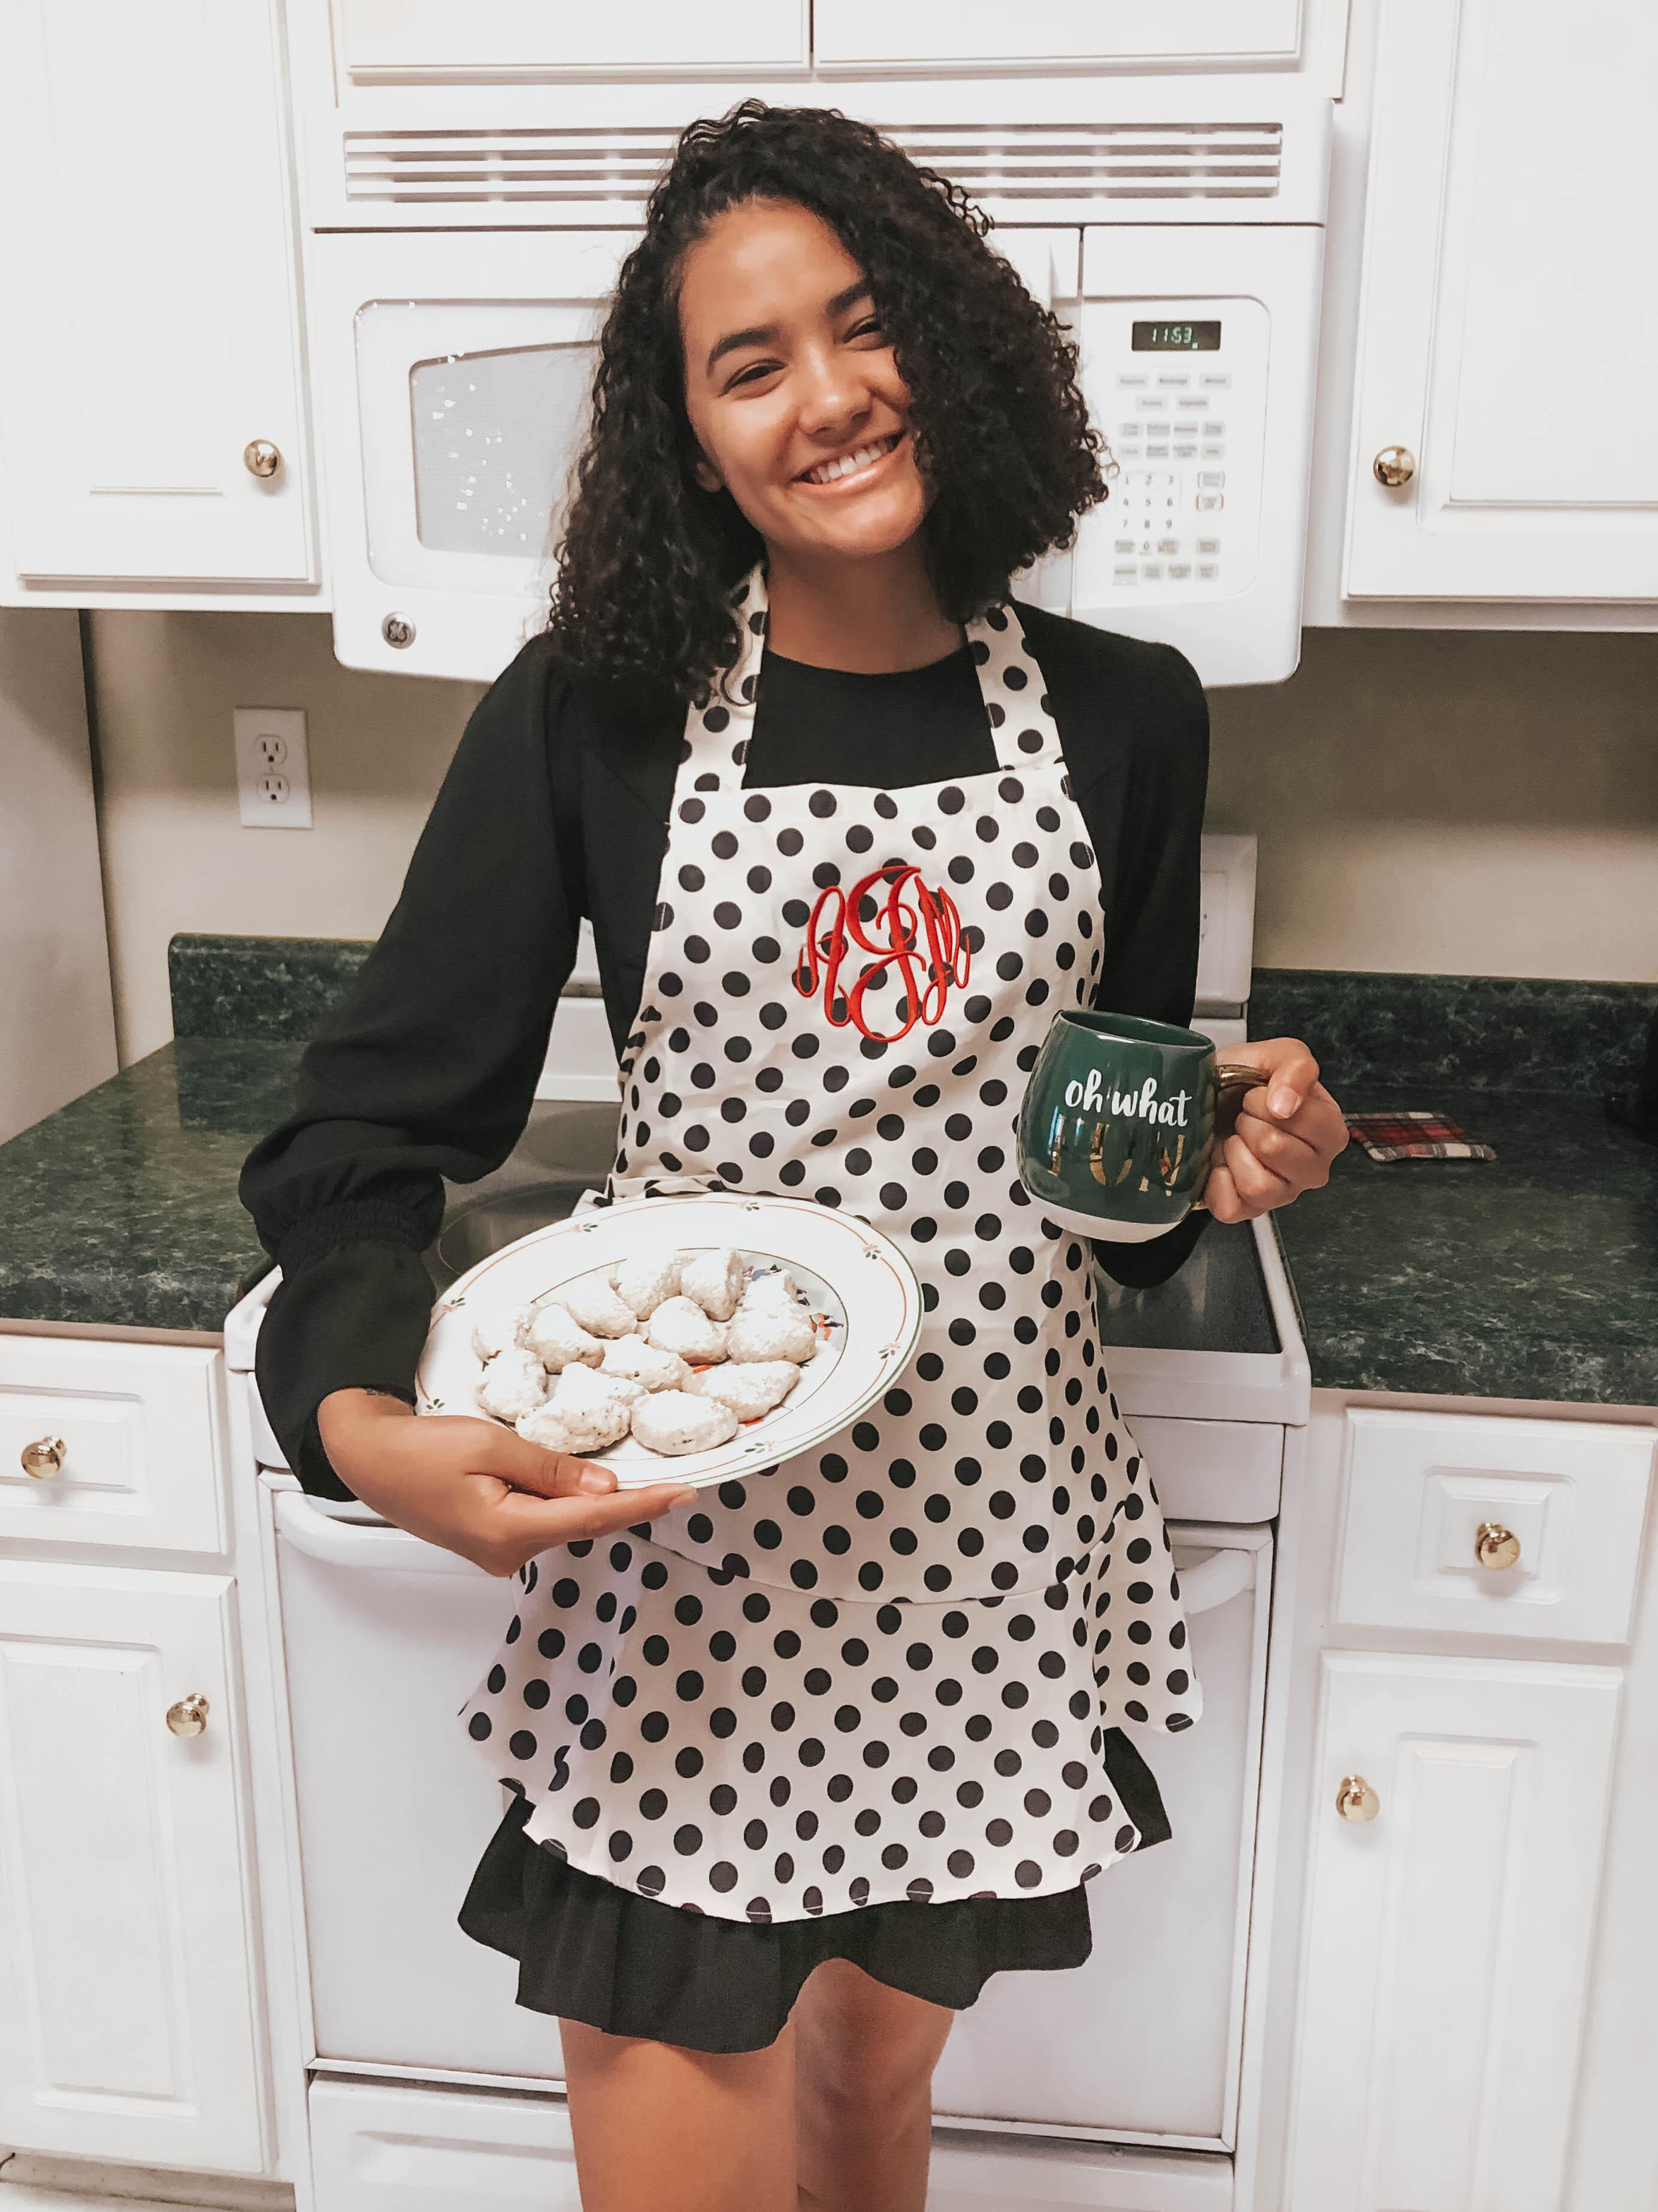 girl-holding-plate-of-pecan-shortbread-meltaway-cookies